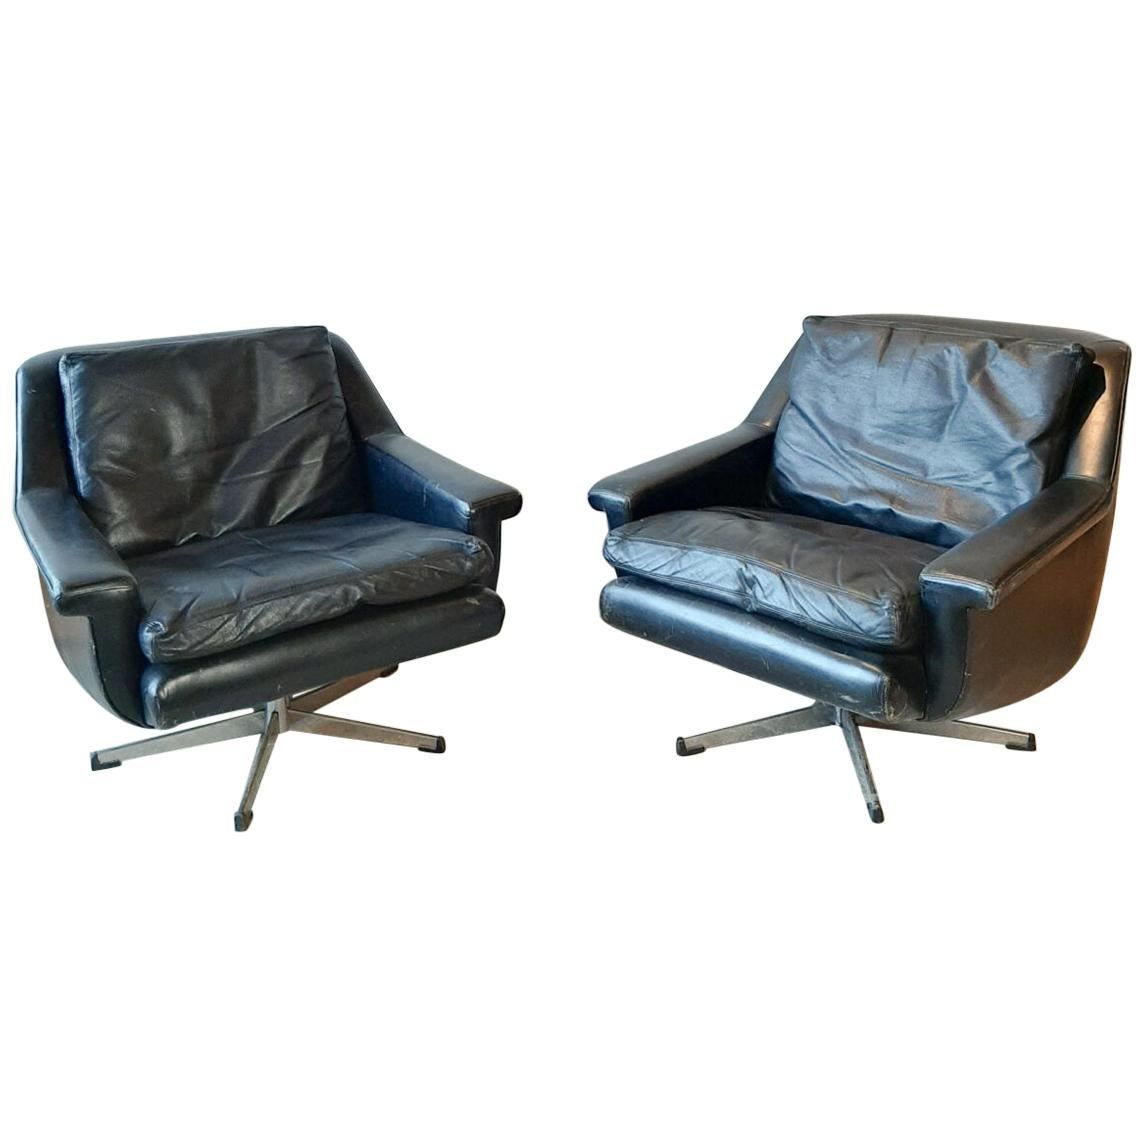 Pair of Midcentury Danish Armchairs by Werner Langefeld for ESA Møbelværk, 1960s